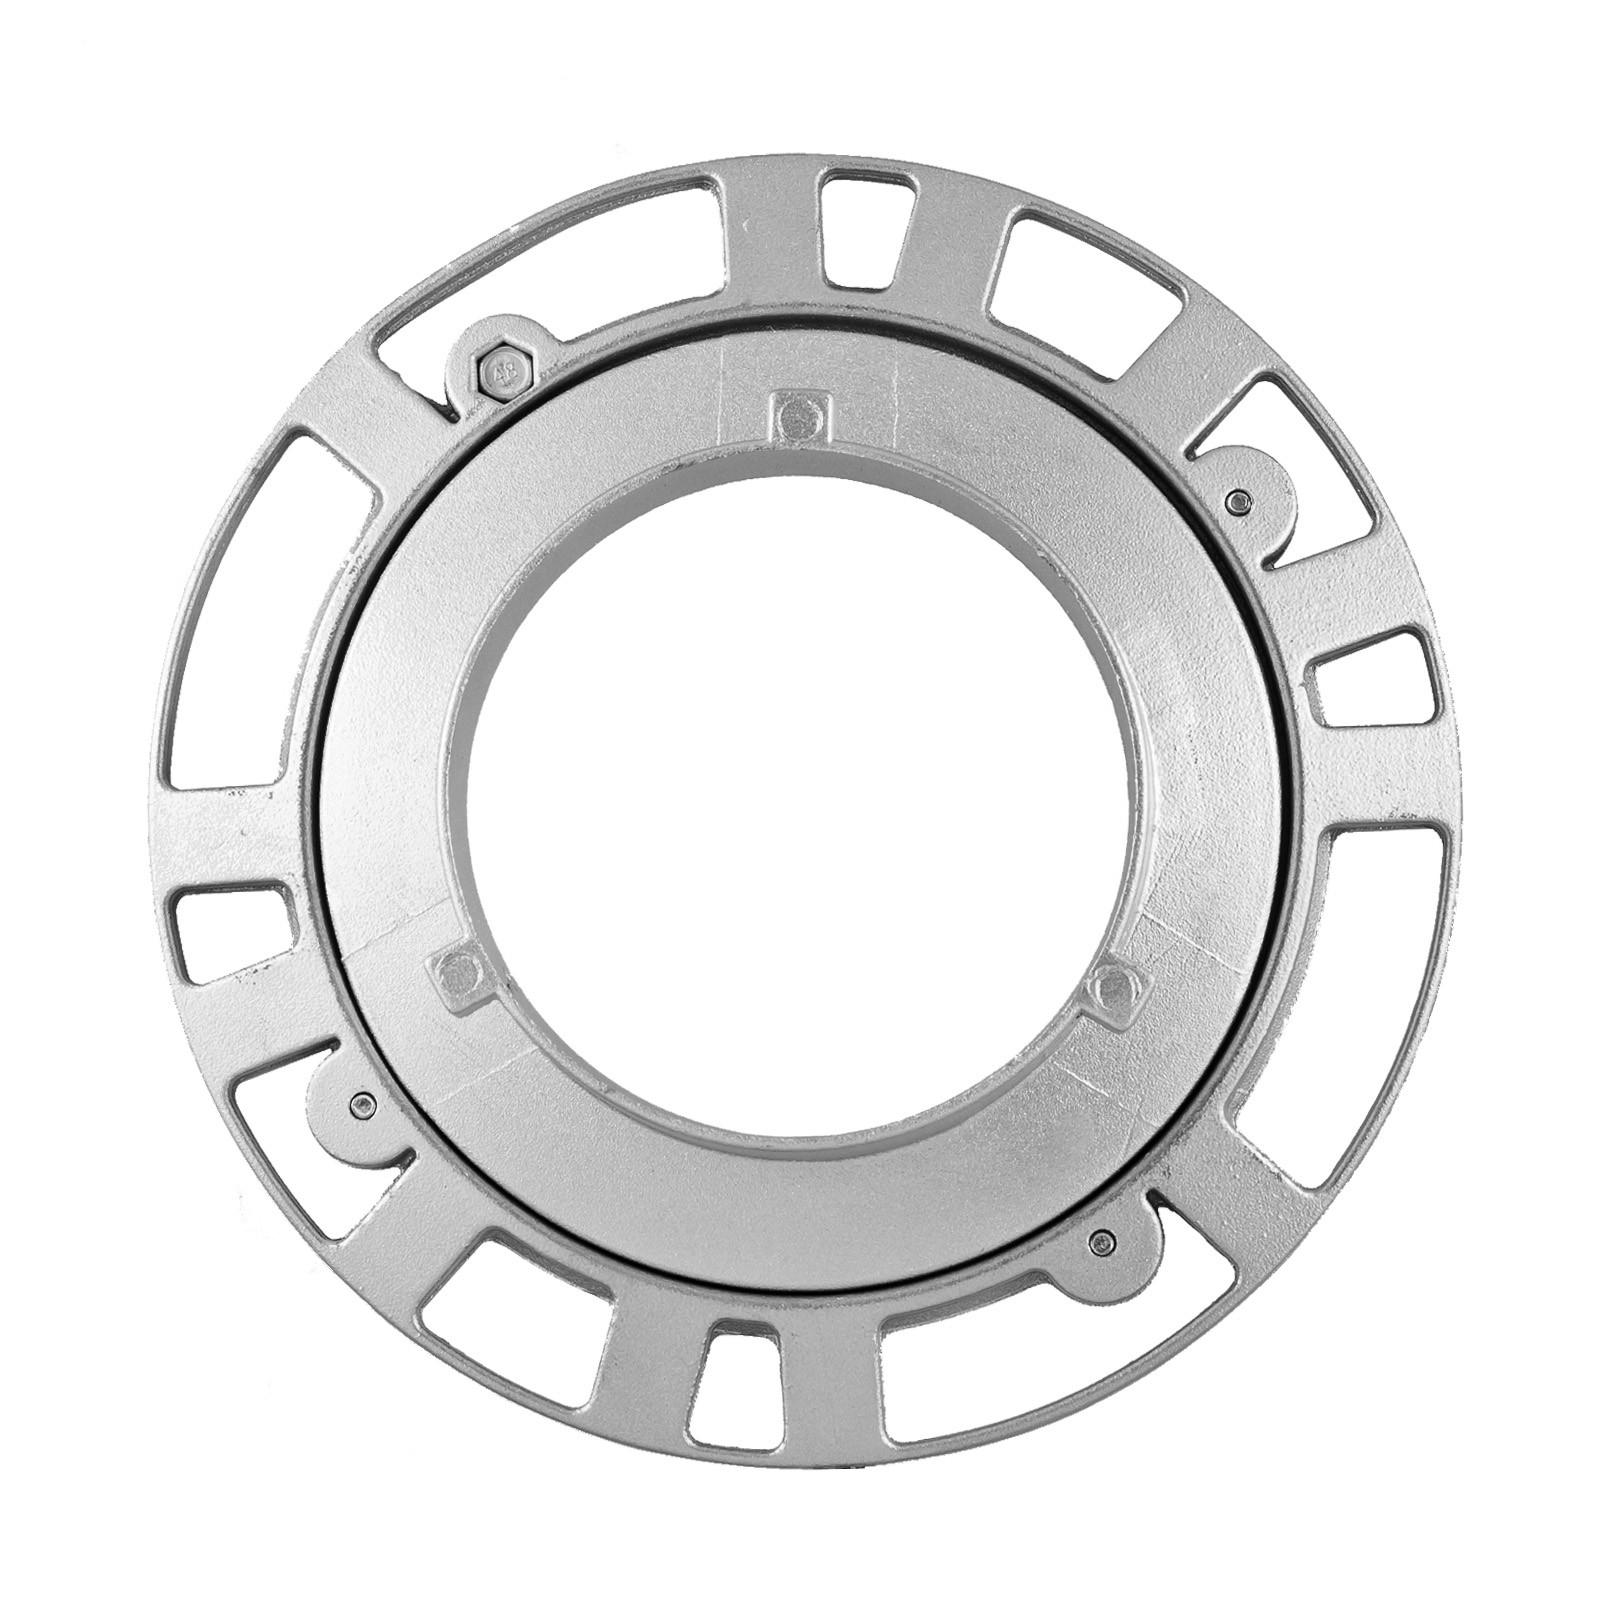 Адаптер Mircopro BW-A для софтбокса Bowens